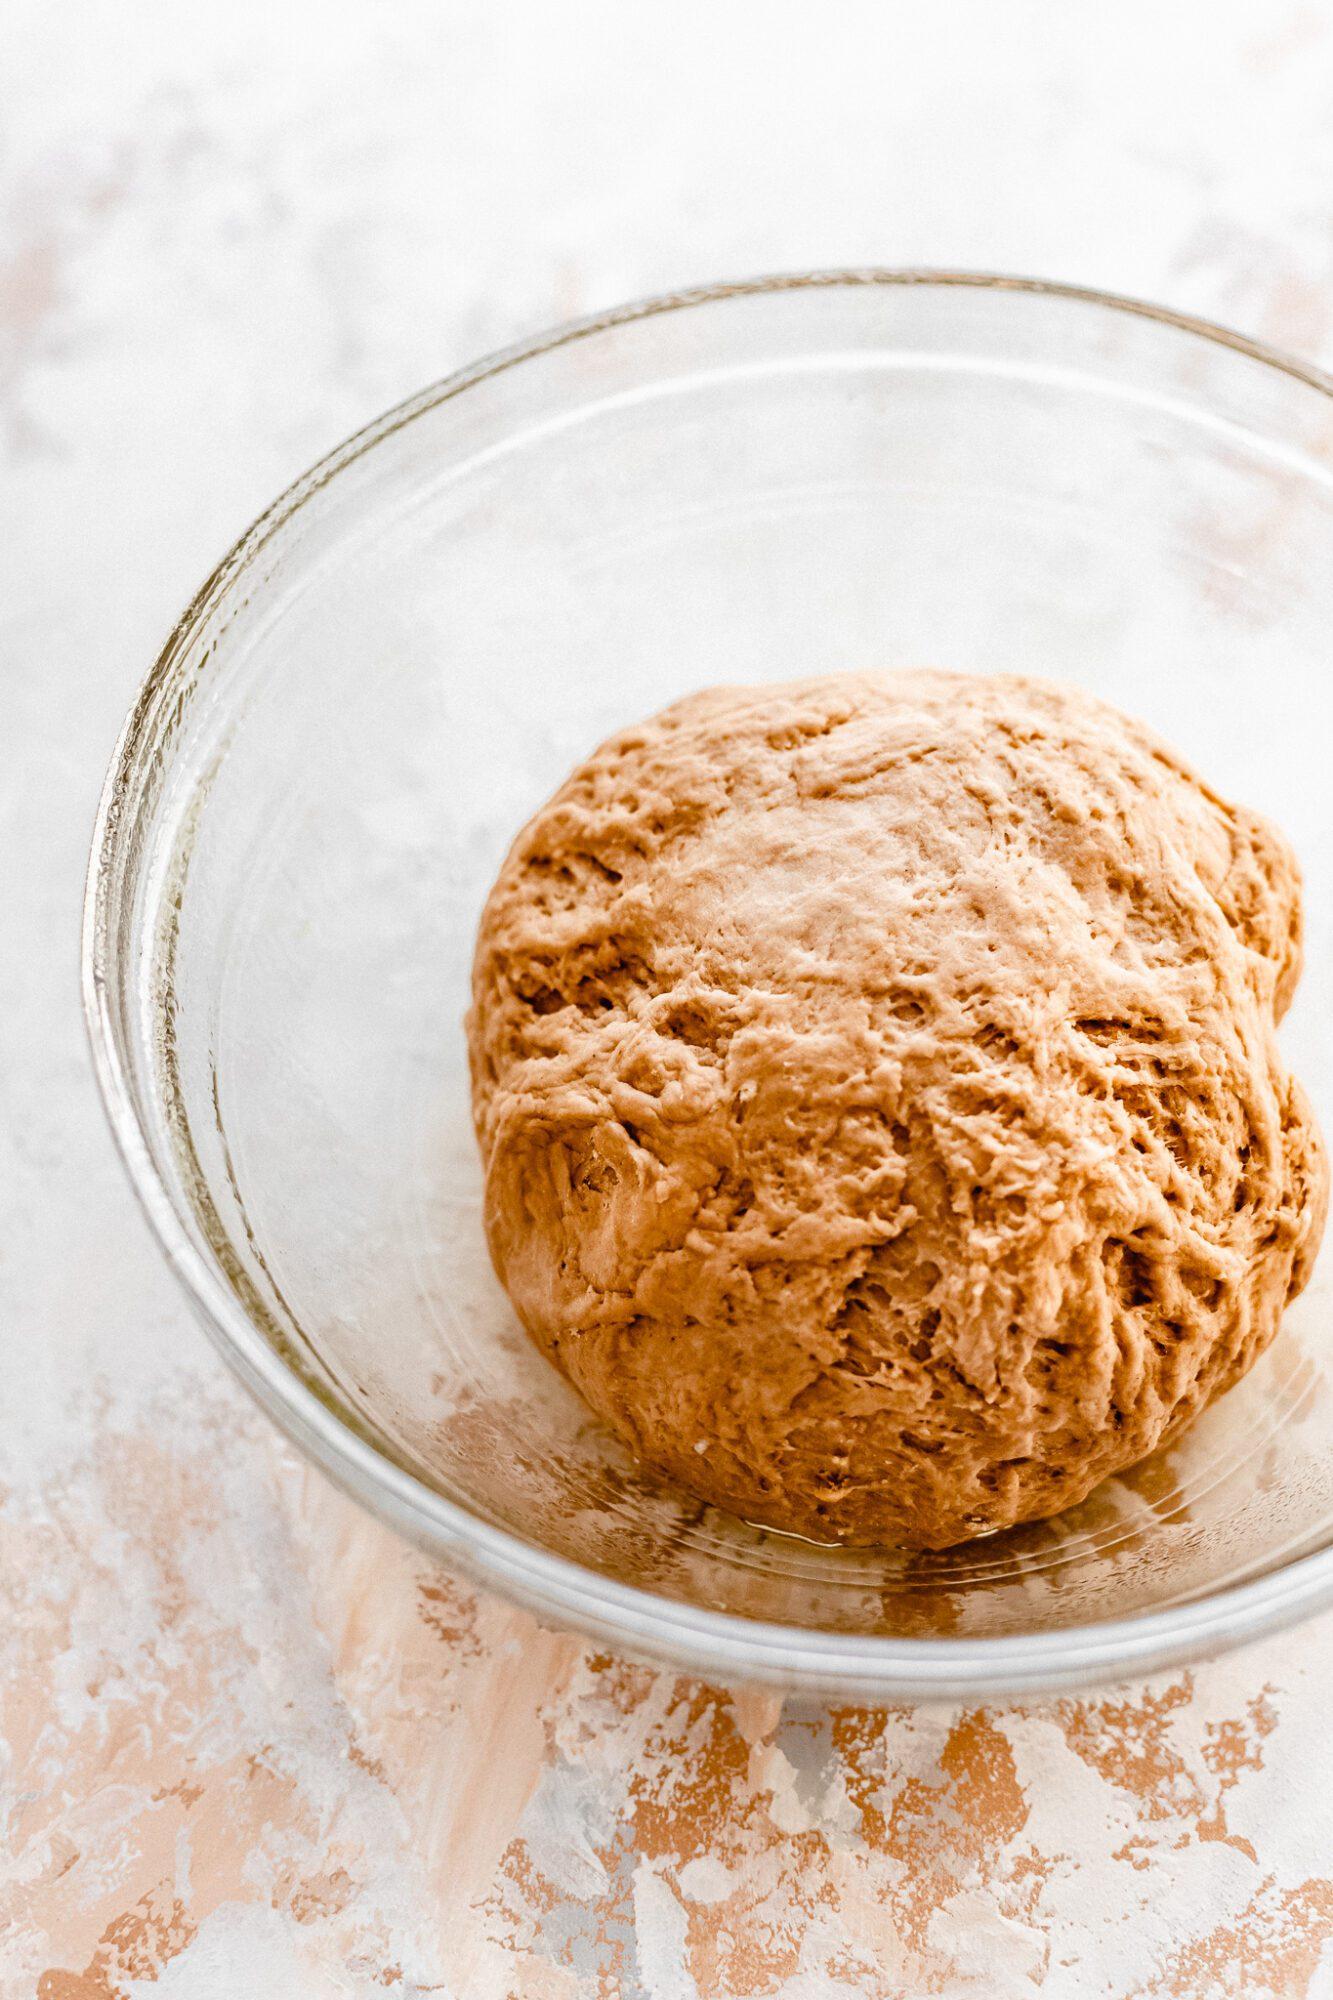 challah dough before it rises